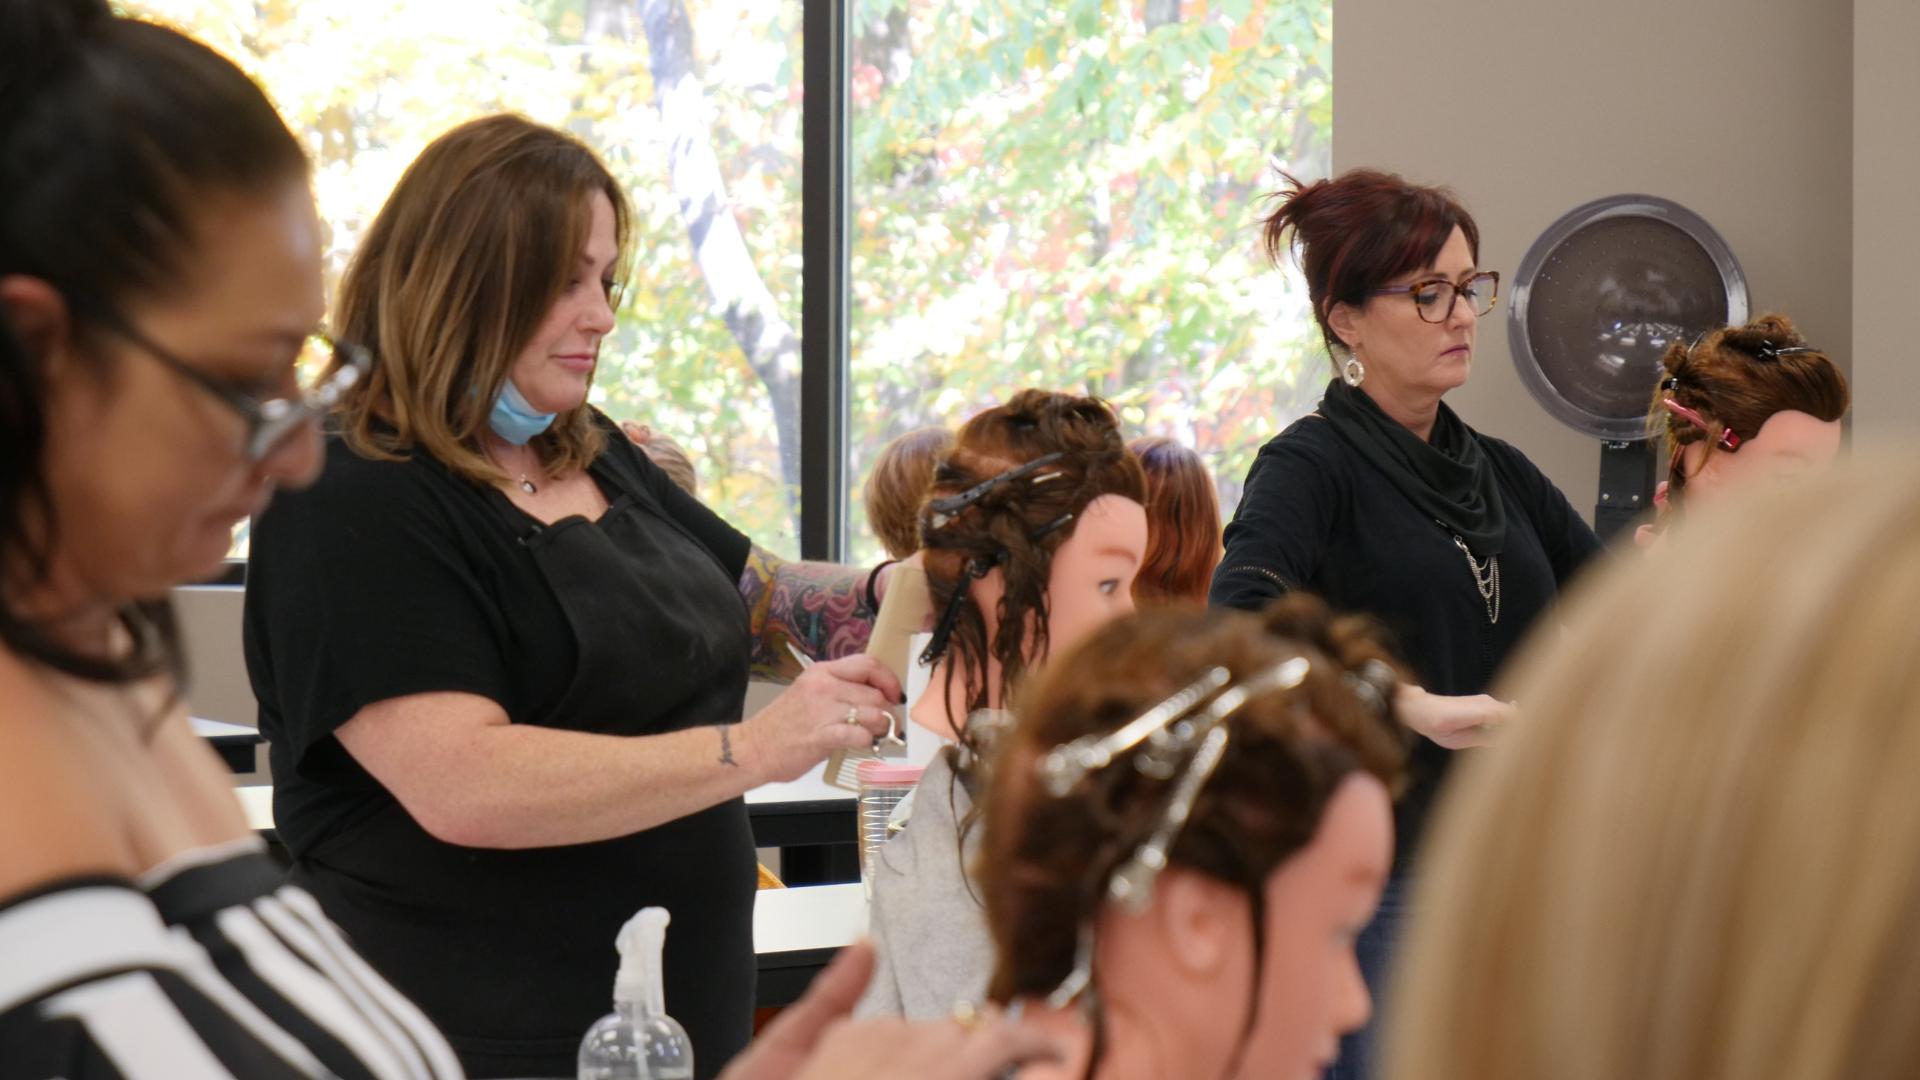 A woman cutting a mannequin head at a Franco Marino Coastline Education Salon Education